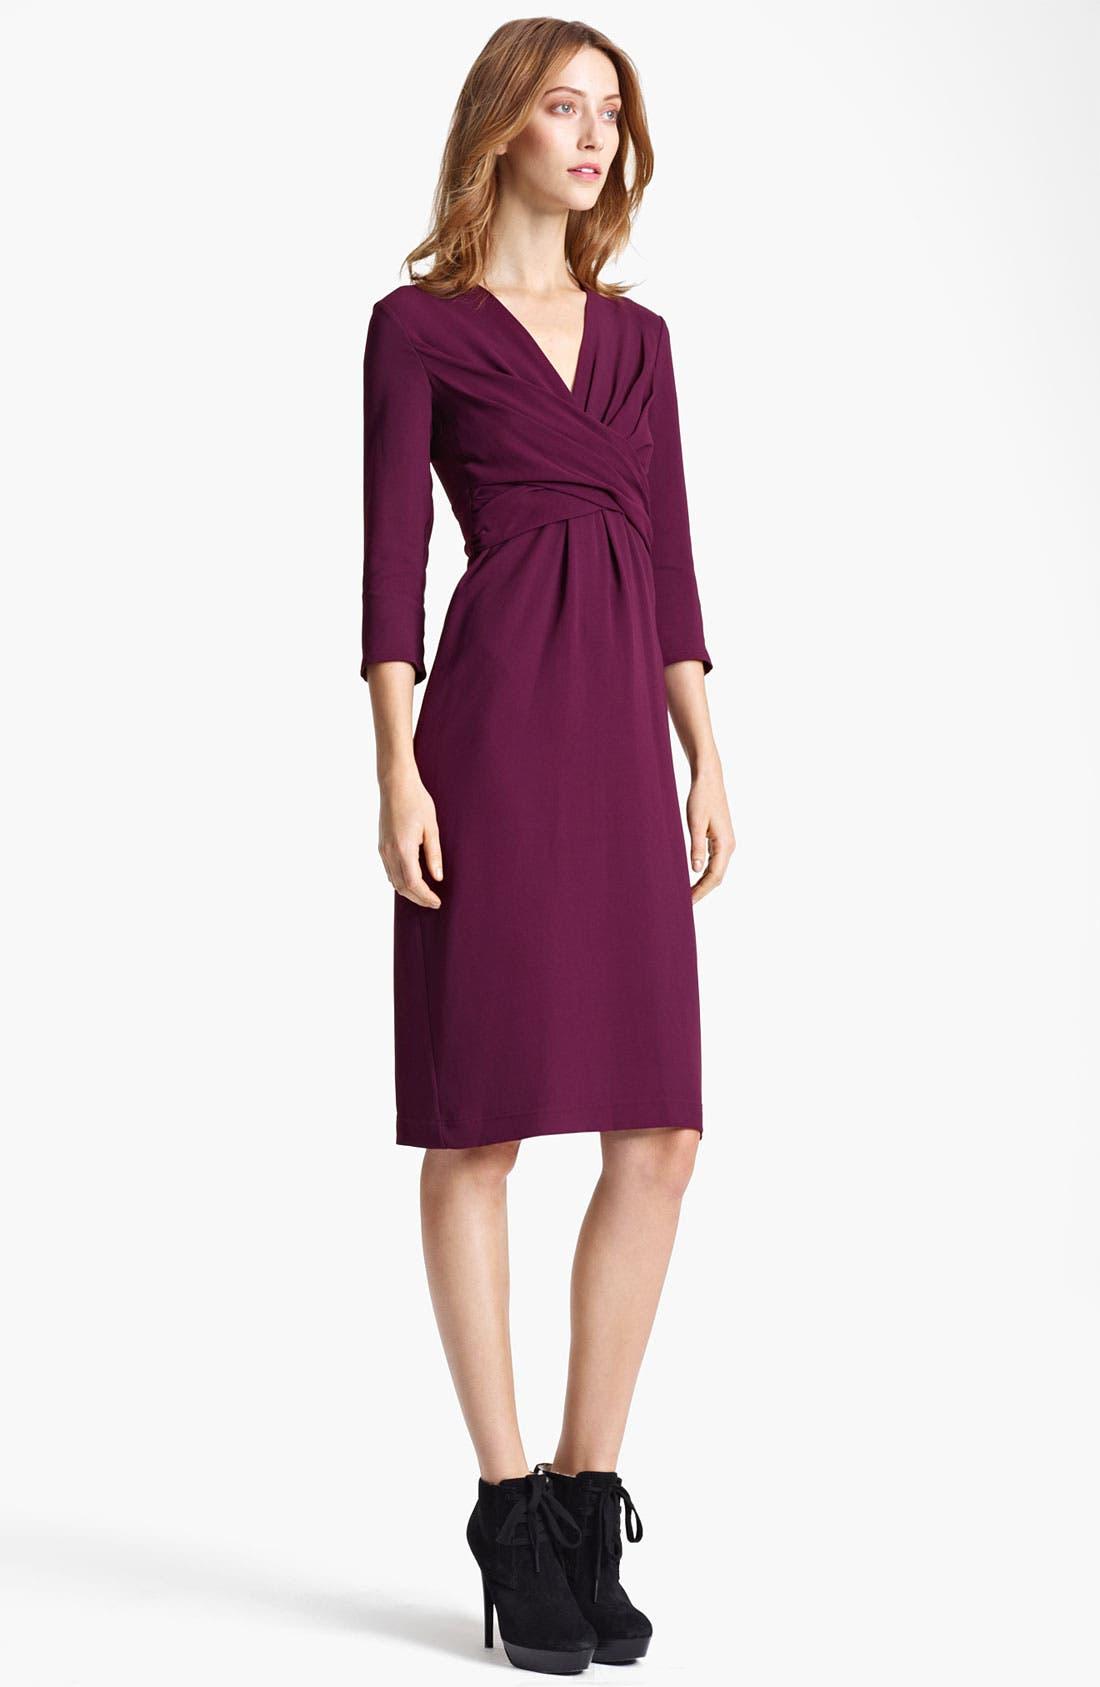 Alternate Image 1 Selected - Burberry London Twisted Waist Crepe Dress